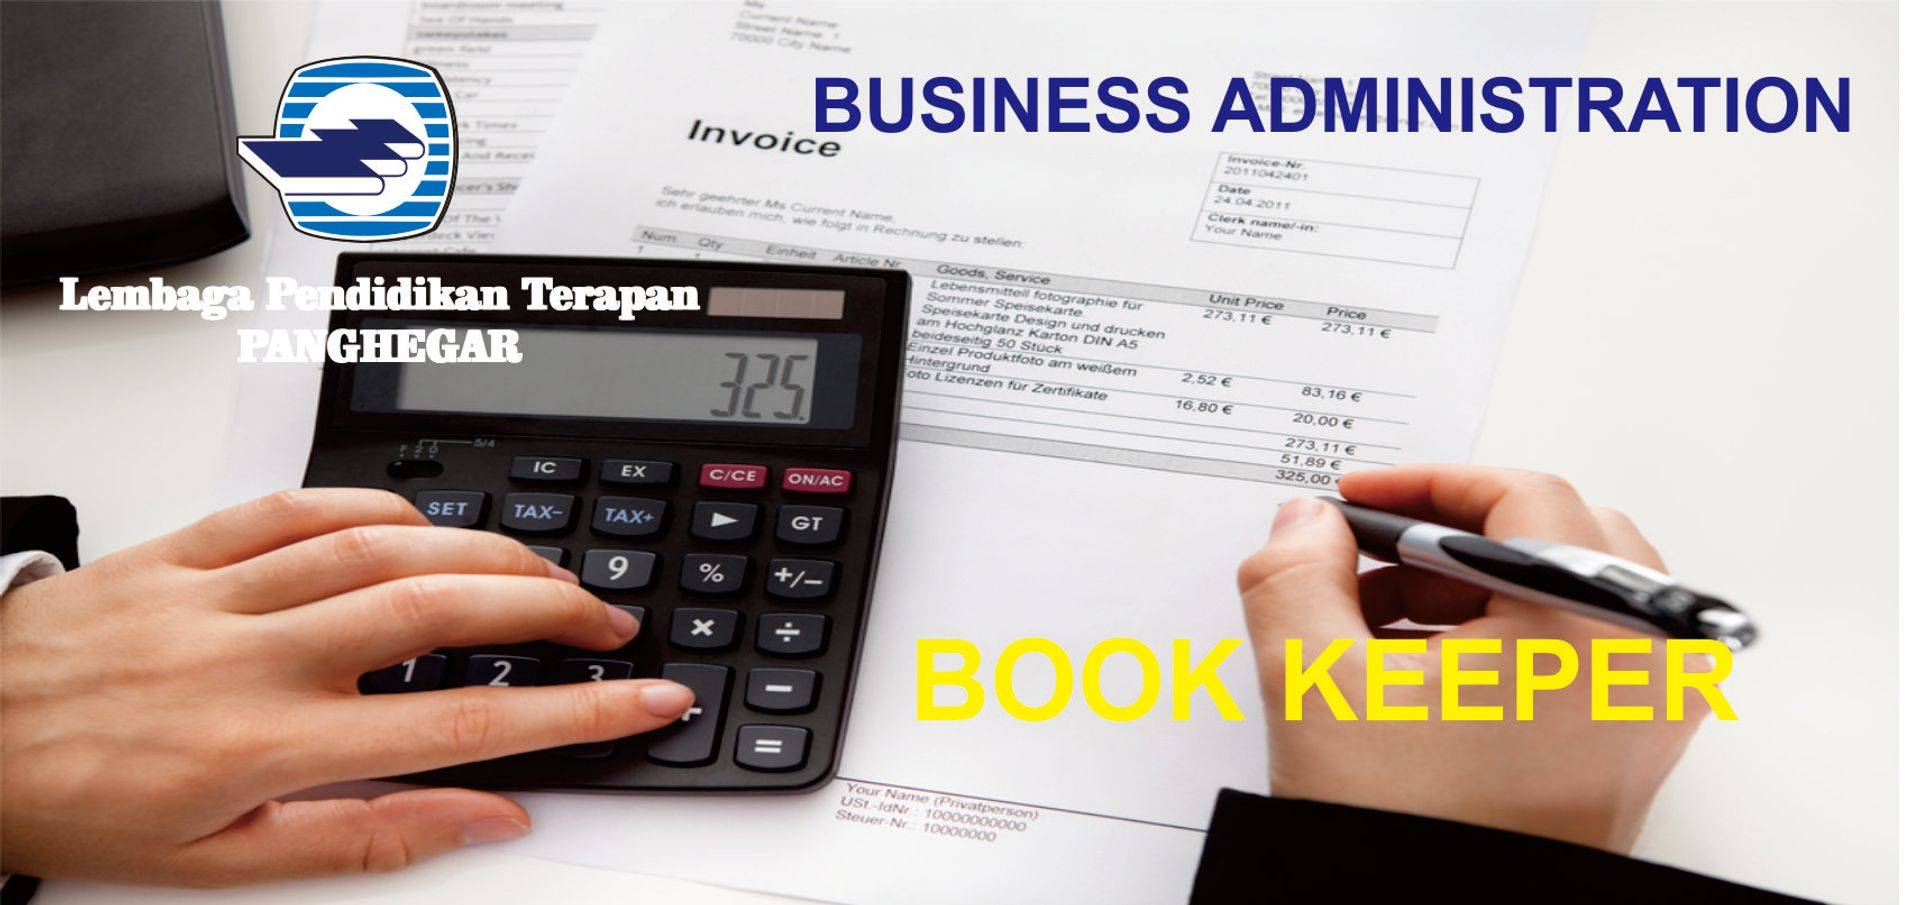 Book Keeper - Administrasi Akuntansi Keuangan